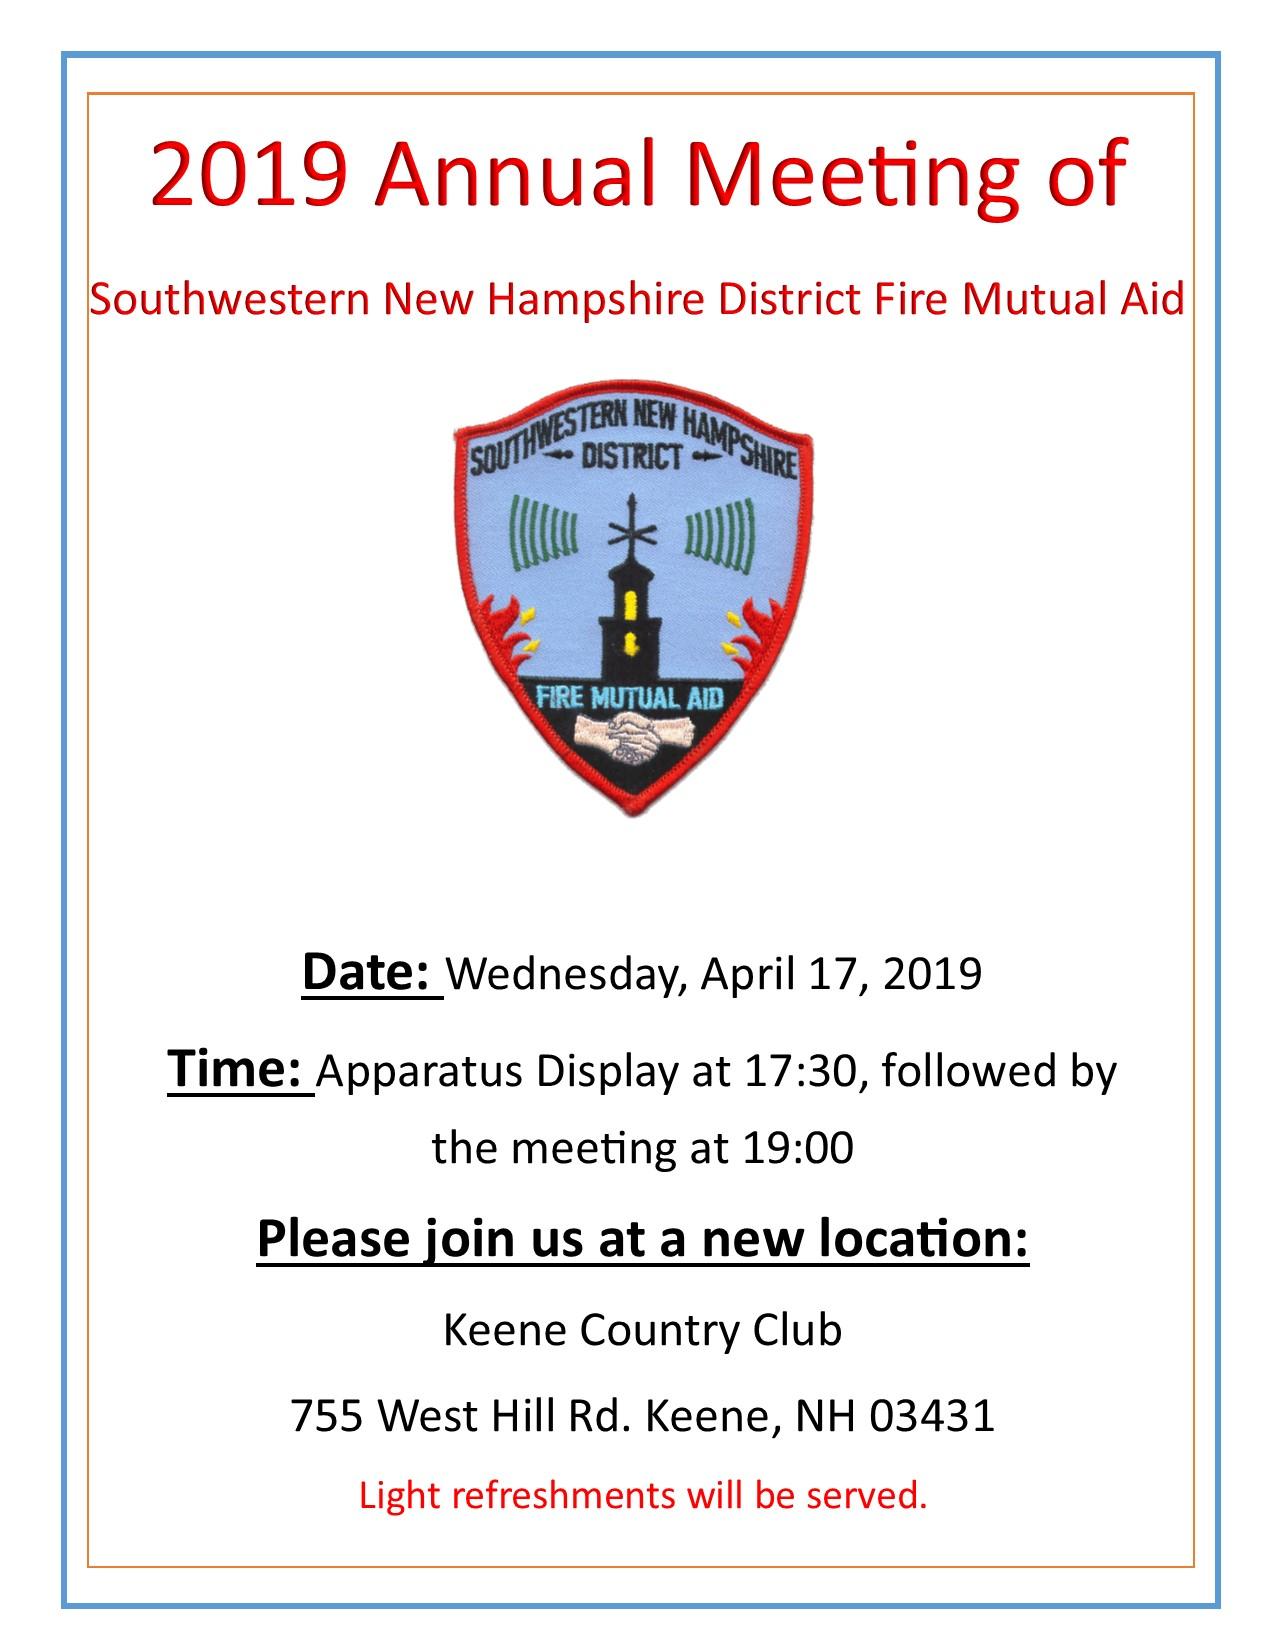 2019 annual meeting flyer.jpg